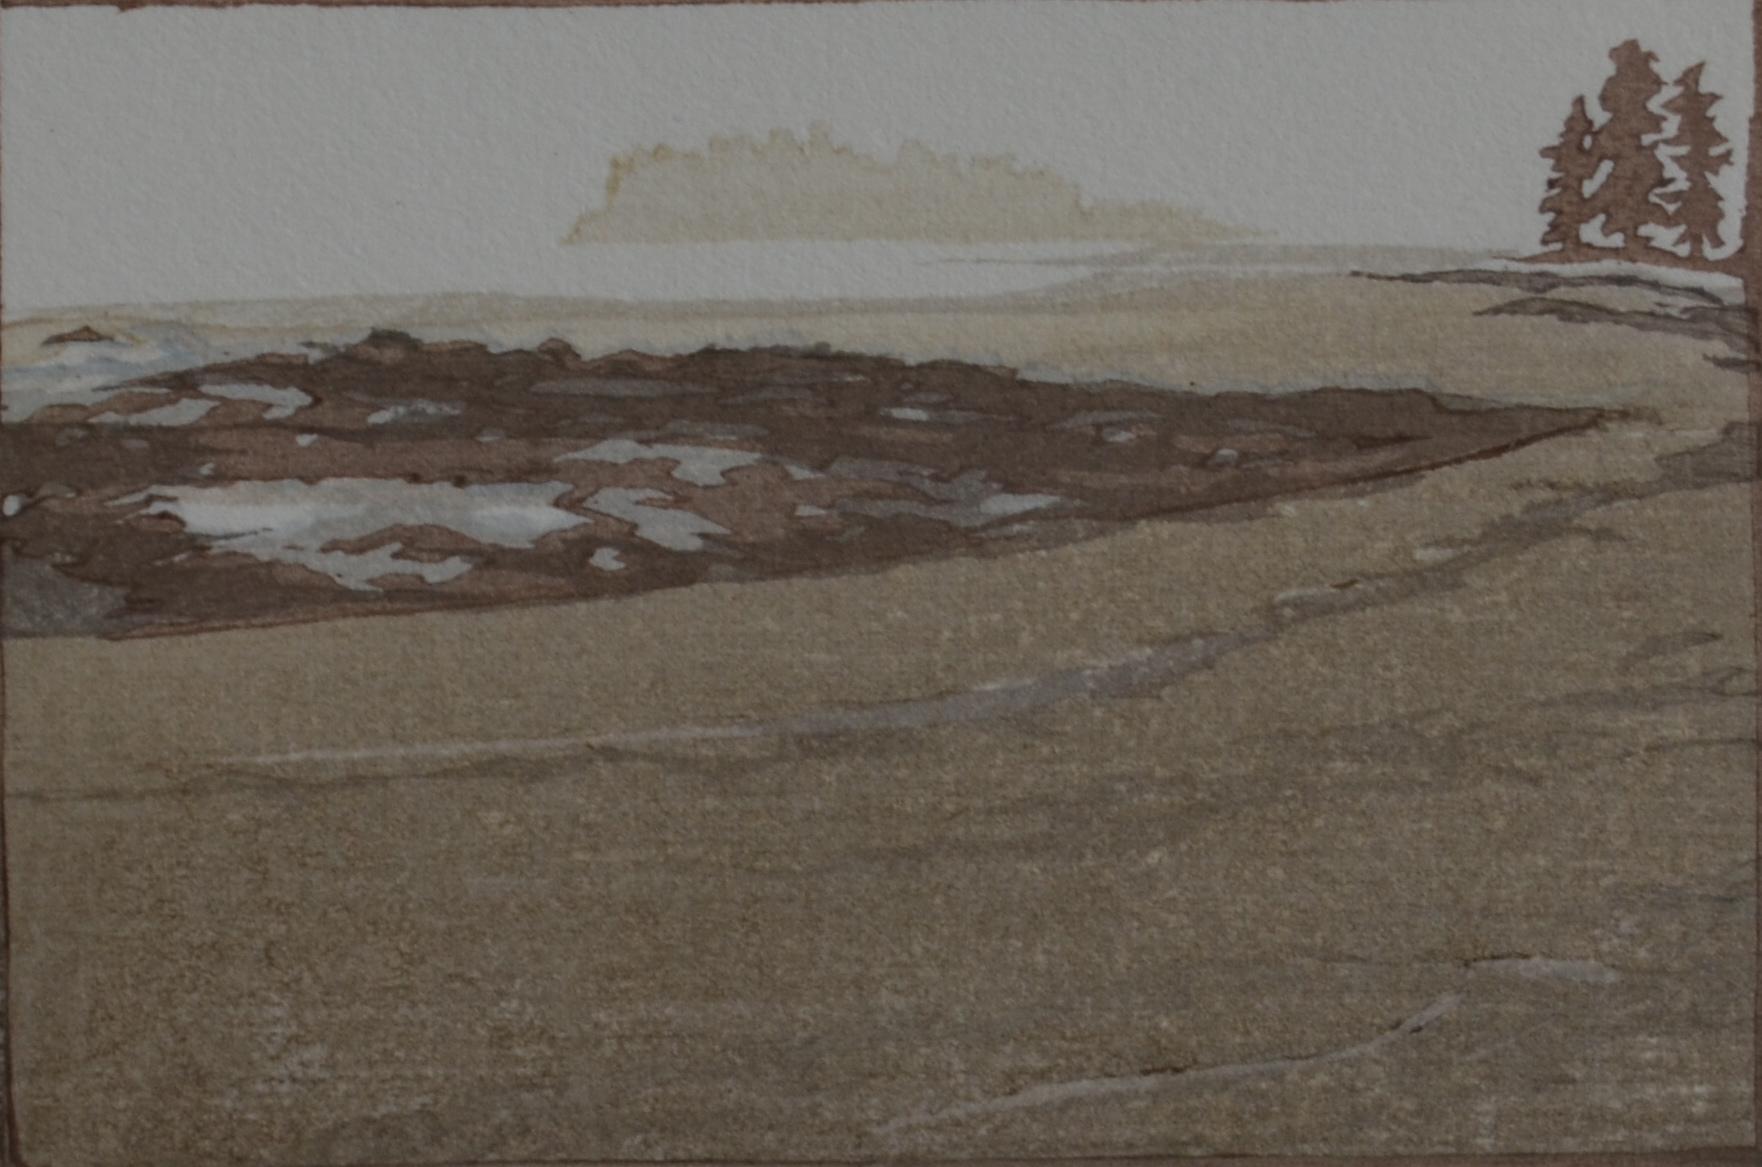 Gilley Beach